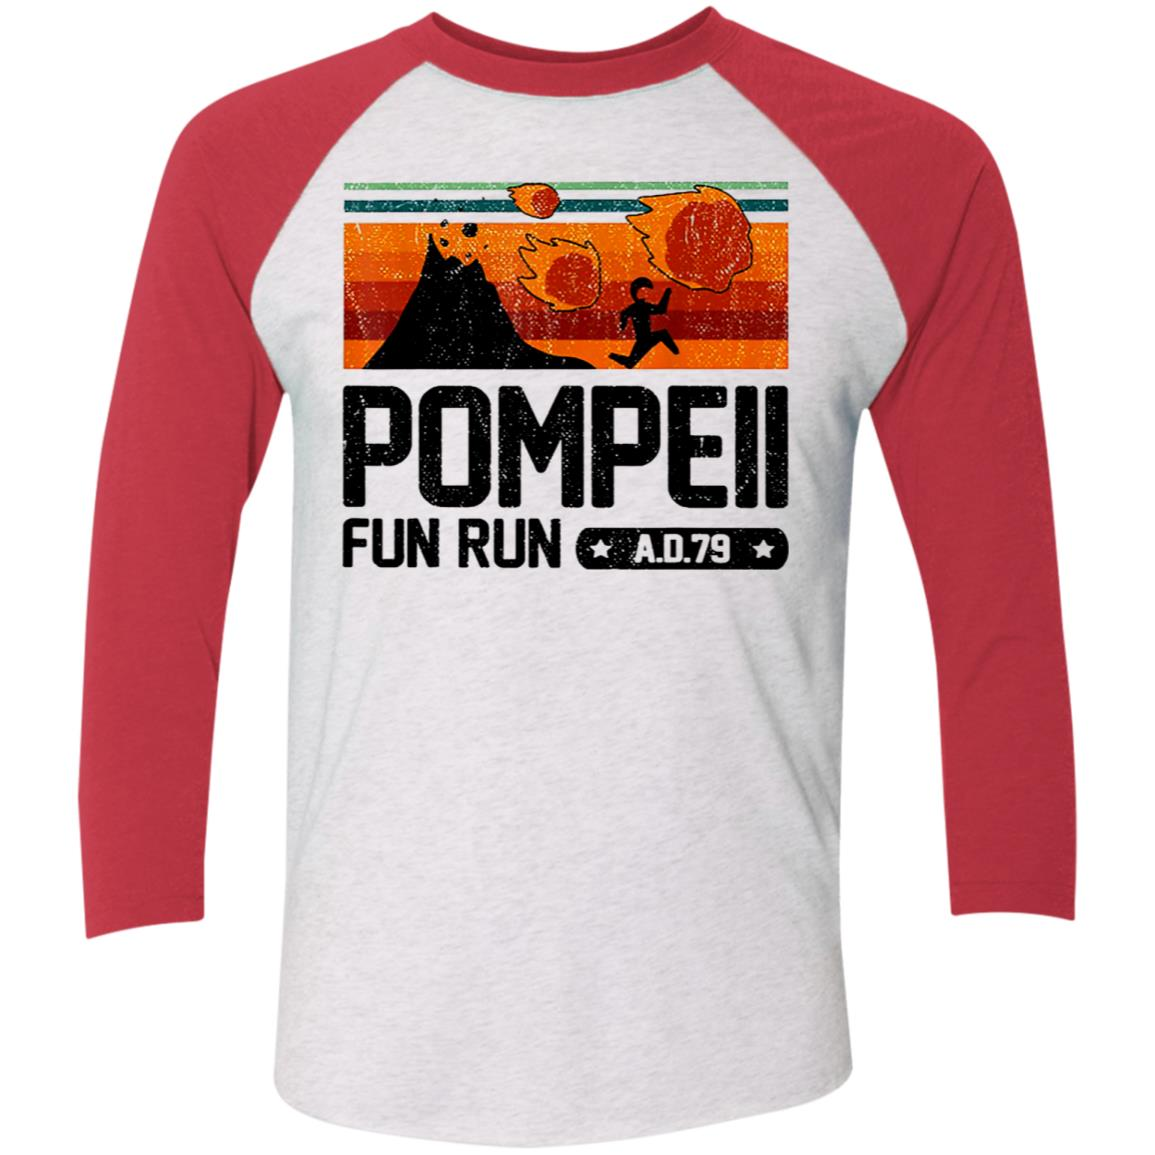 Pompeii Fun Run 79 AD Retro Vintage T-Shirt Men/'s Cotton Shirts Short Sleeve Tee